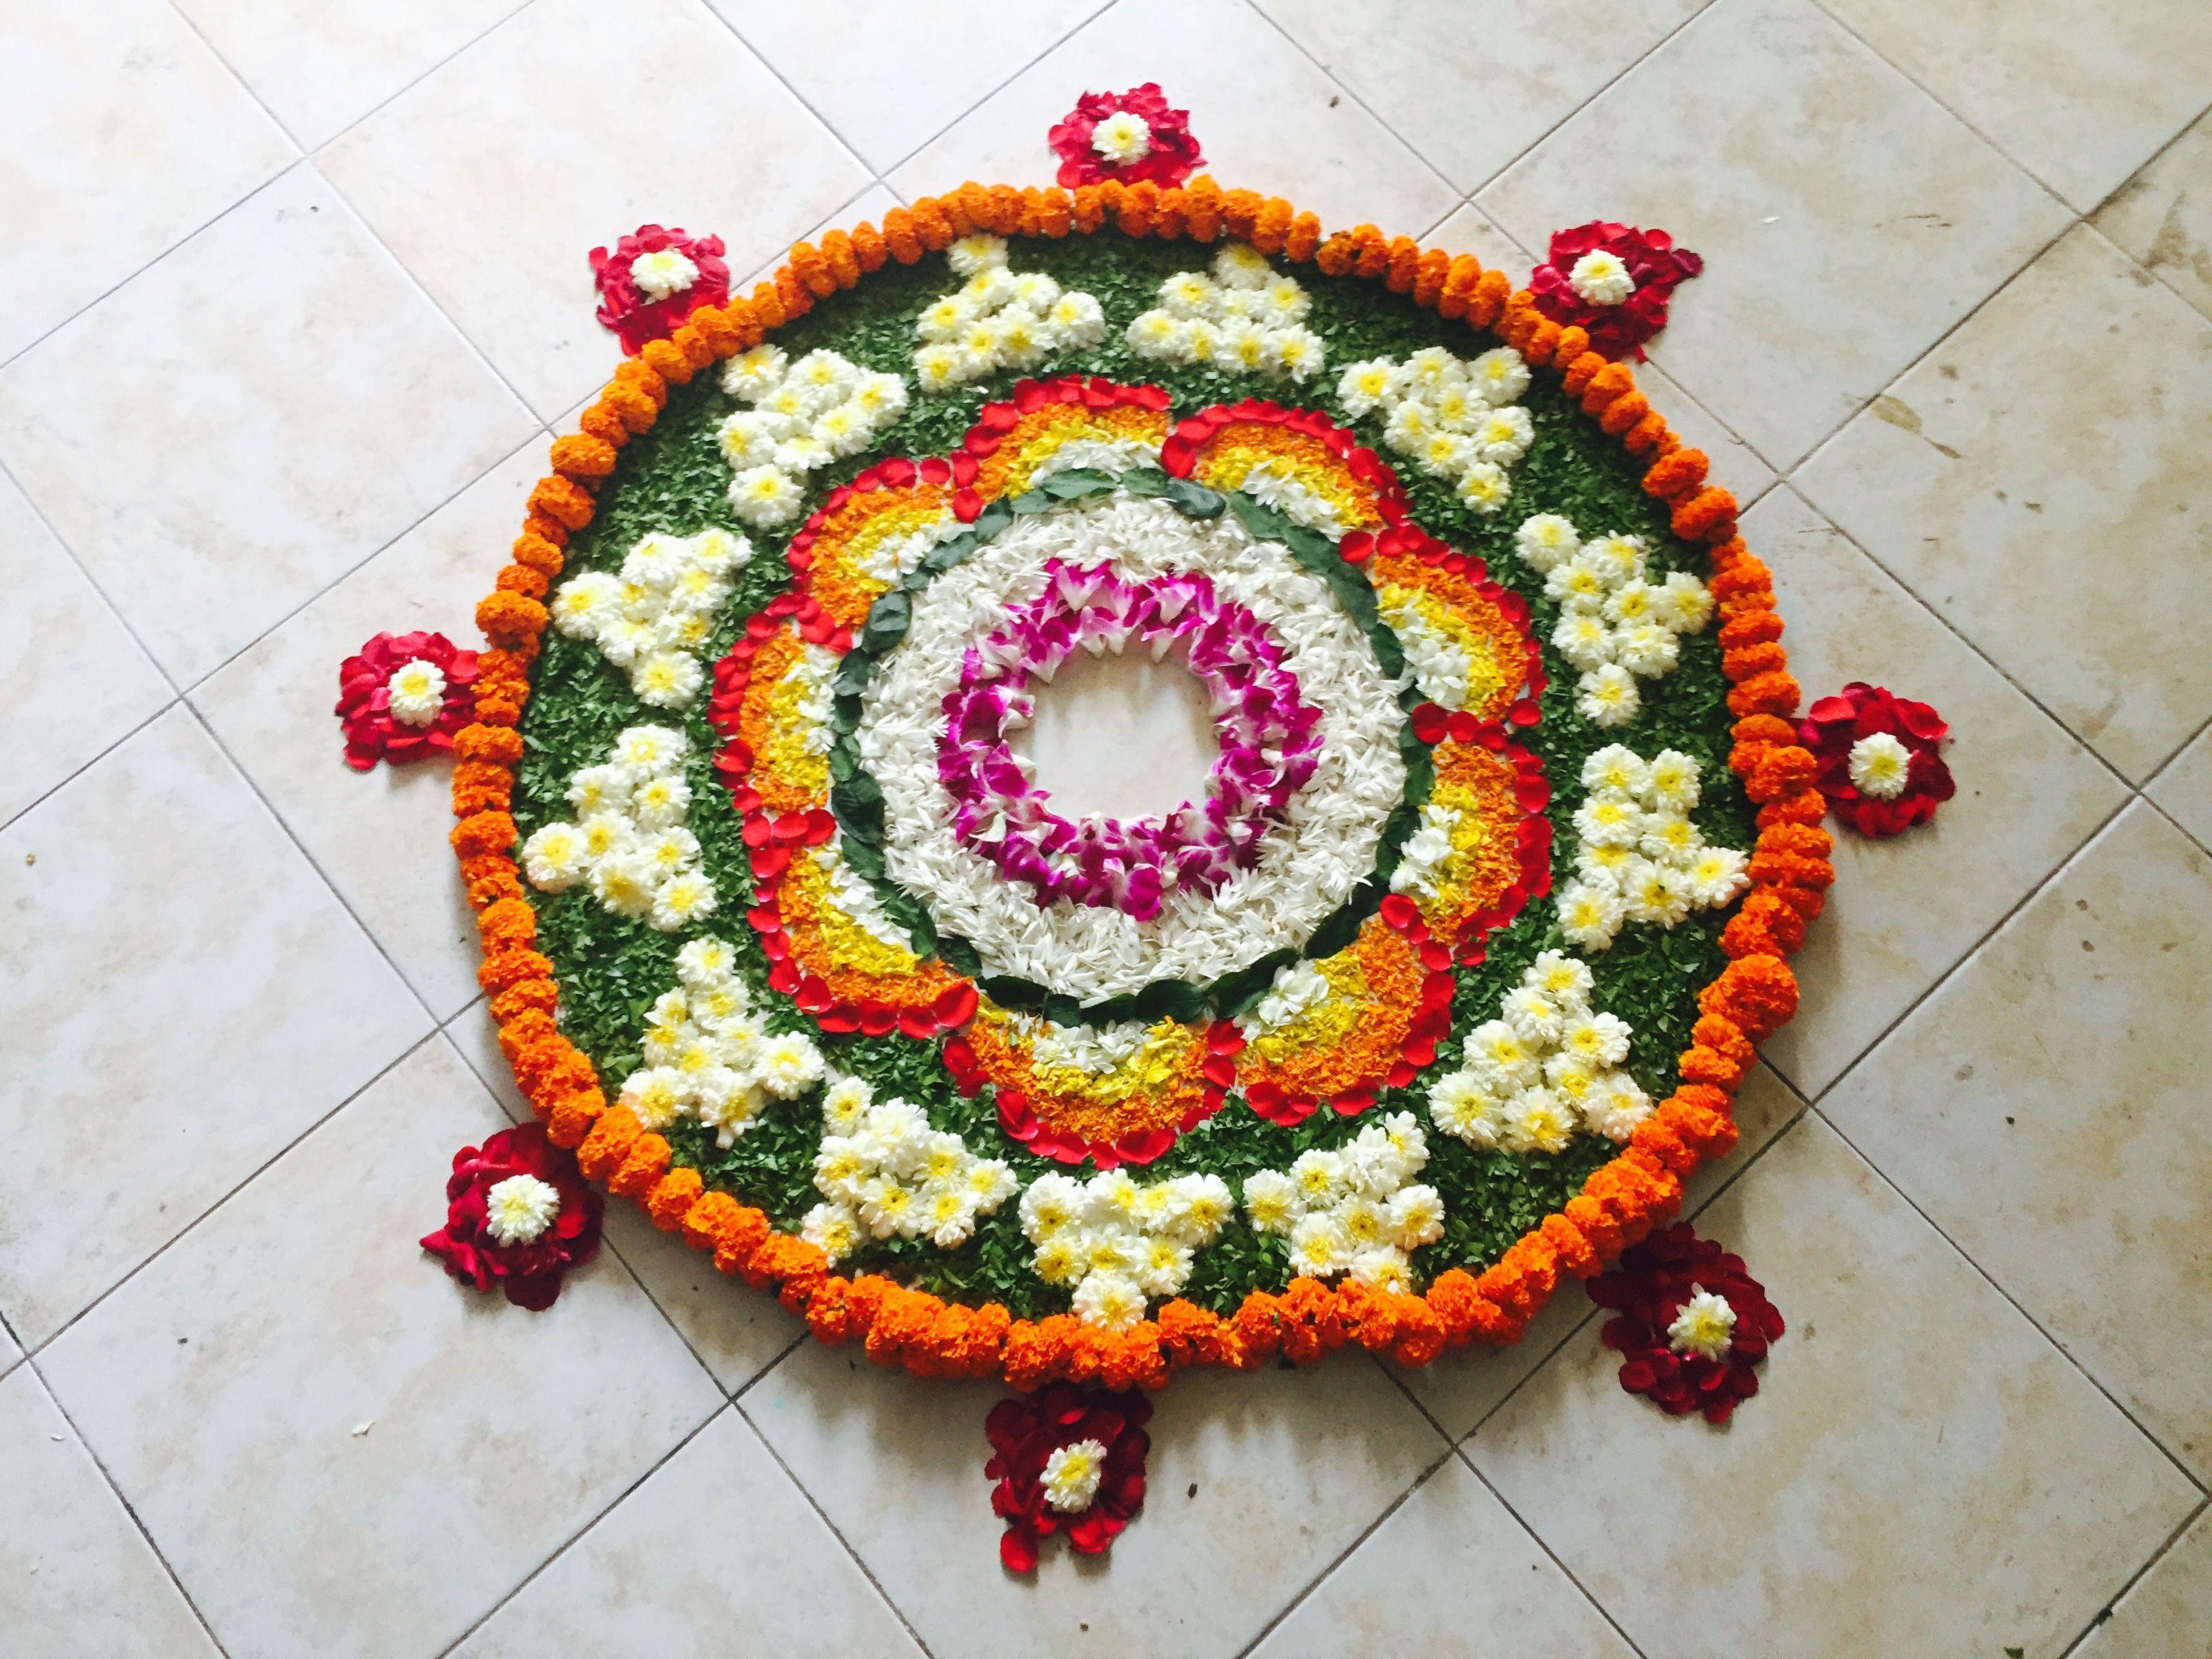 Diy House Housewarming Flower Rangoli Floor Decoration Using Flower Petals Leaves In Centre Place A Flower Rangoli Flower Decorations Rangoli Ideas